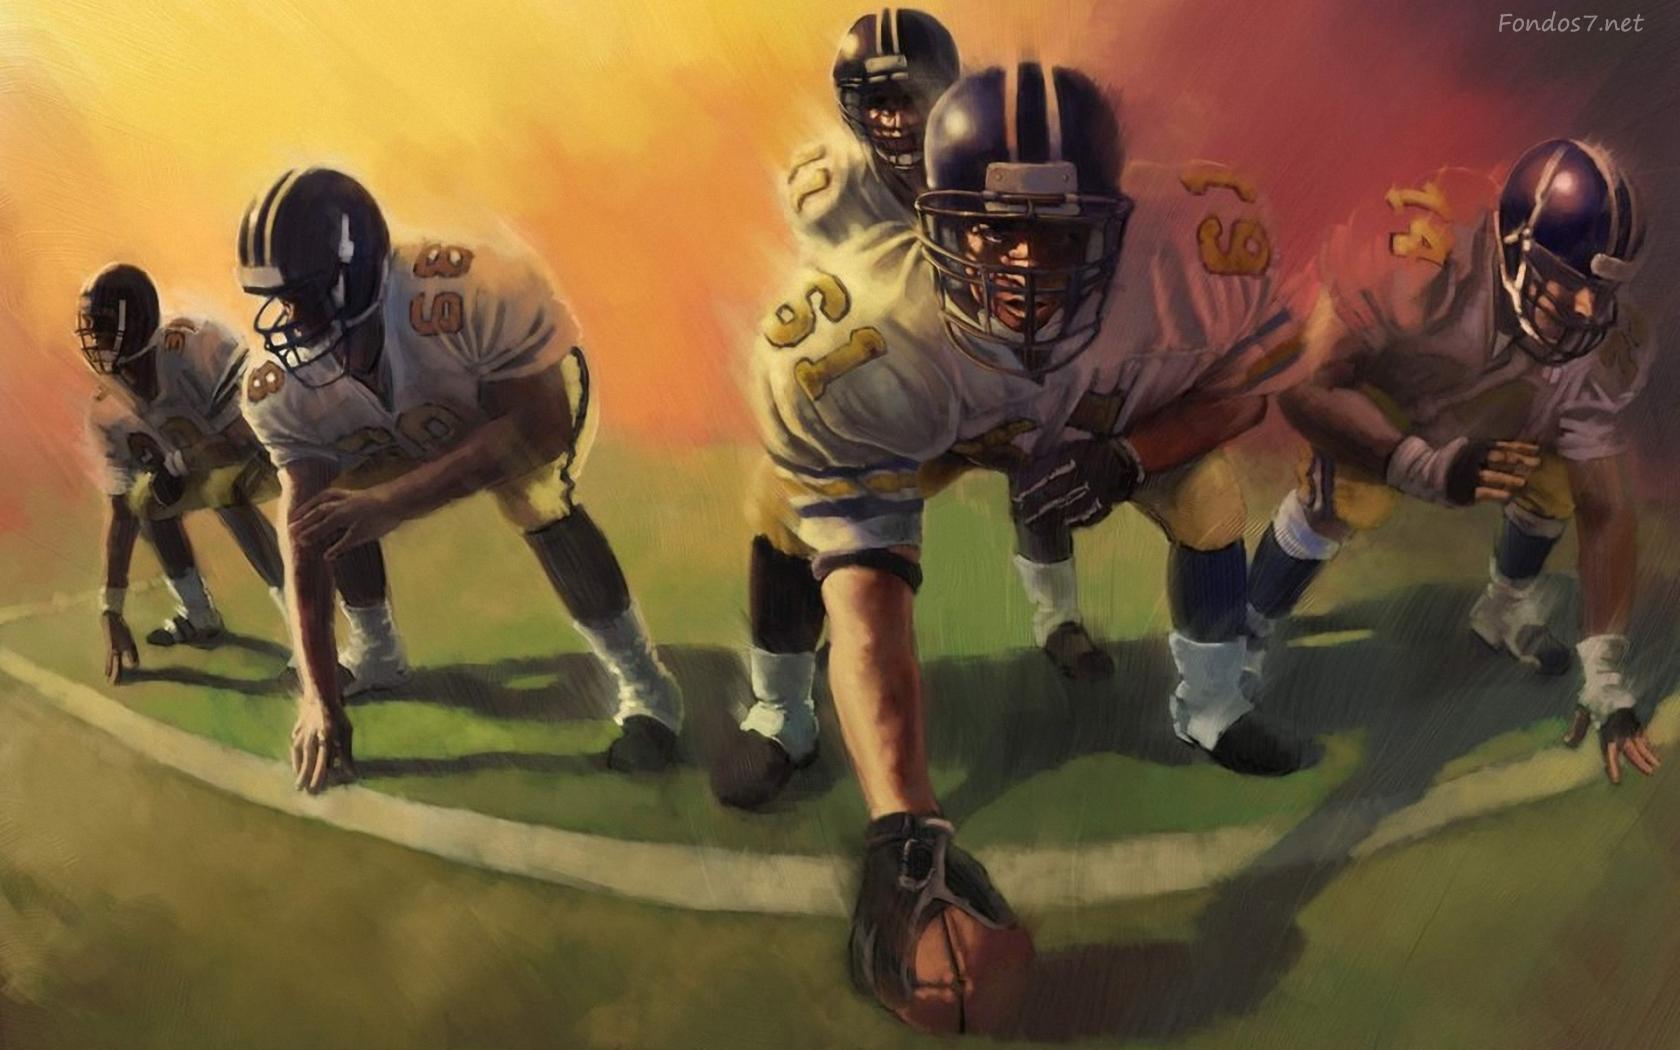 American Football Wallpaper wallpaper American Football Wallpaper hd 1680x1050